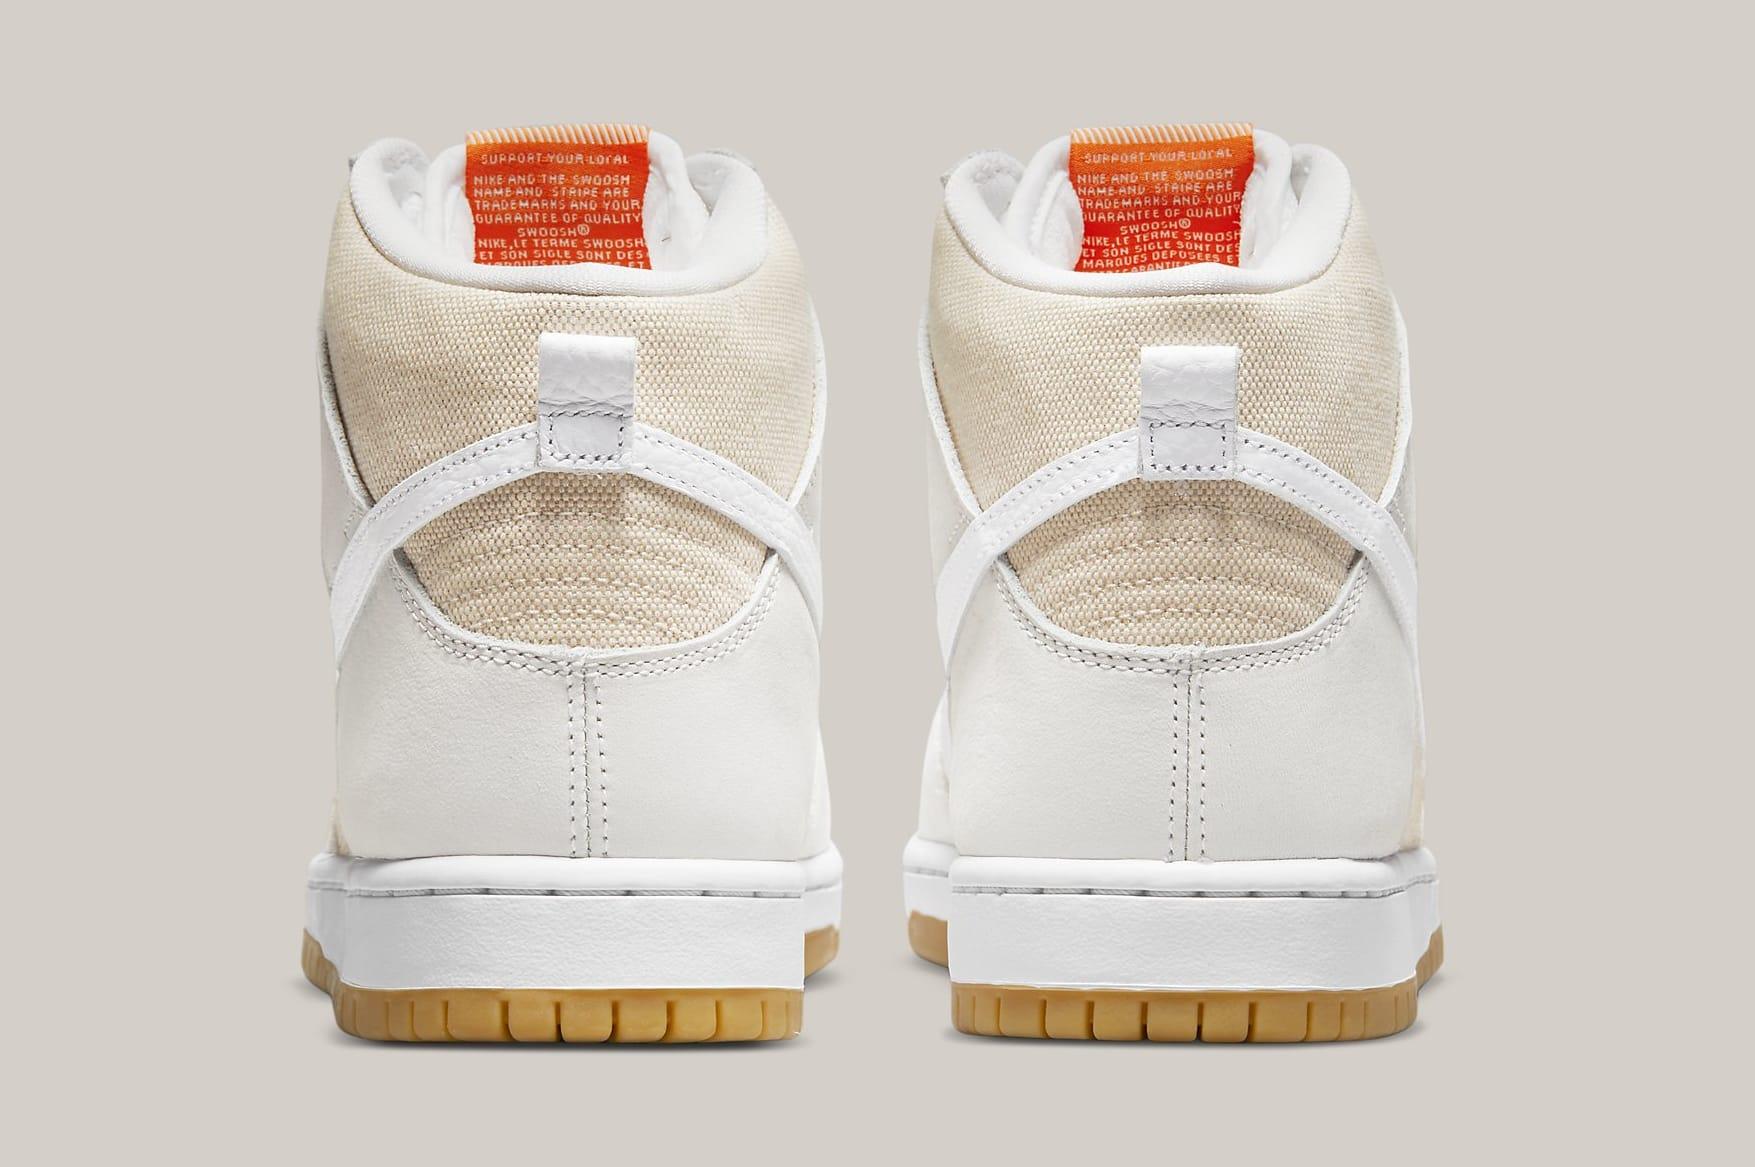 Nike SB Dunk High 'Unbleached' DA9626-100 Heel